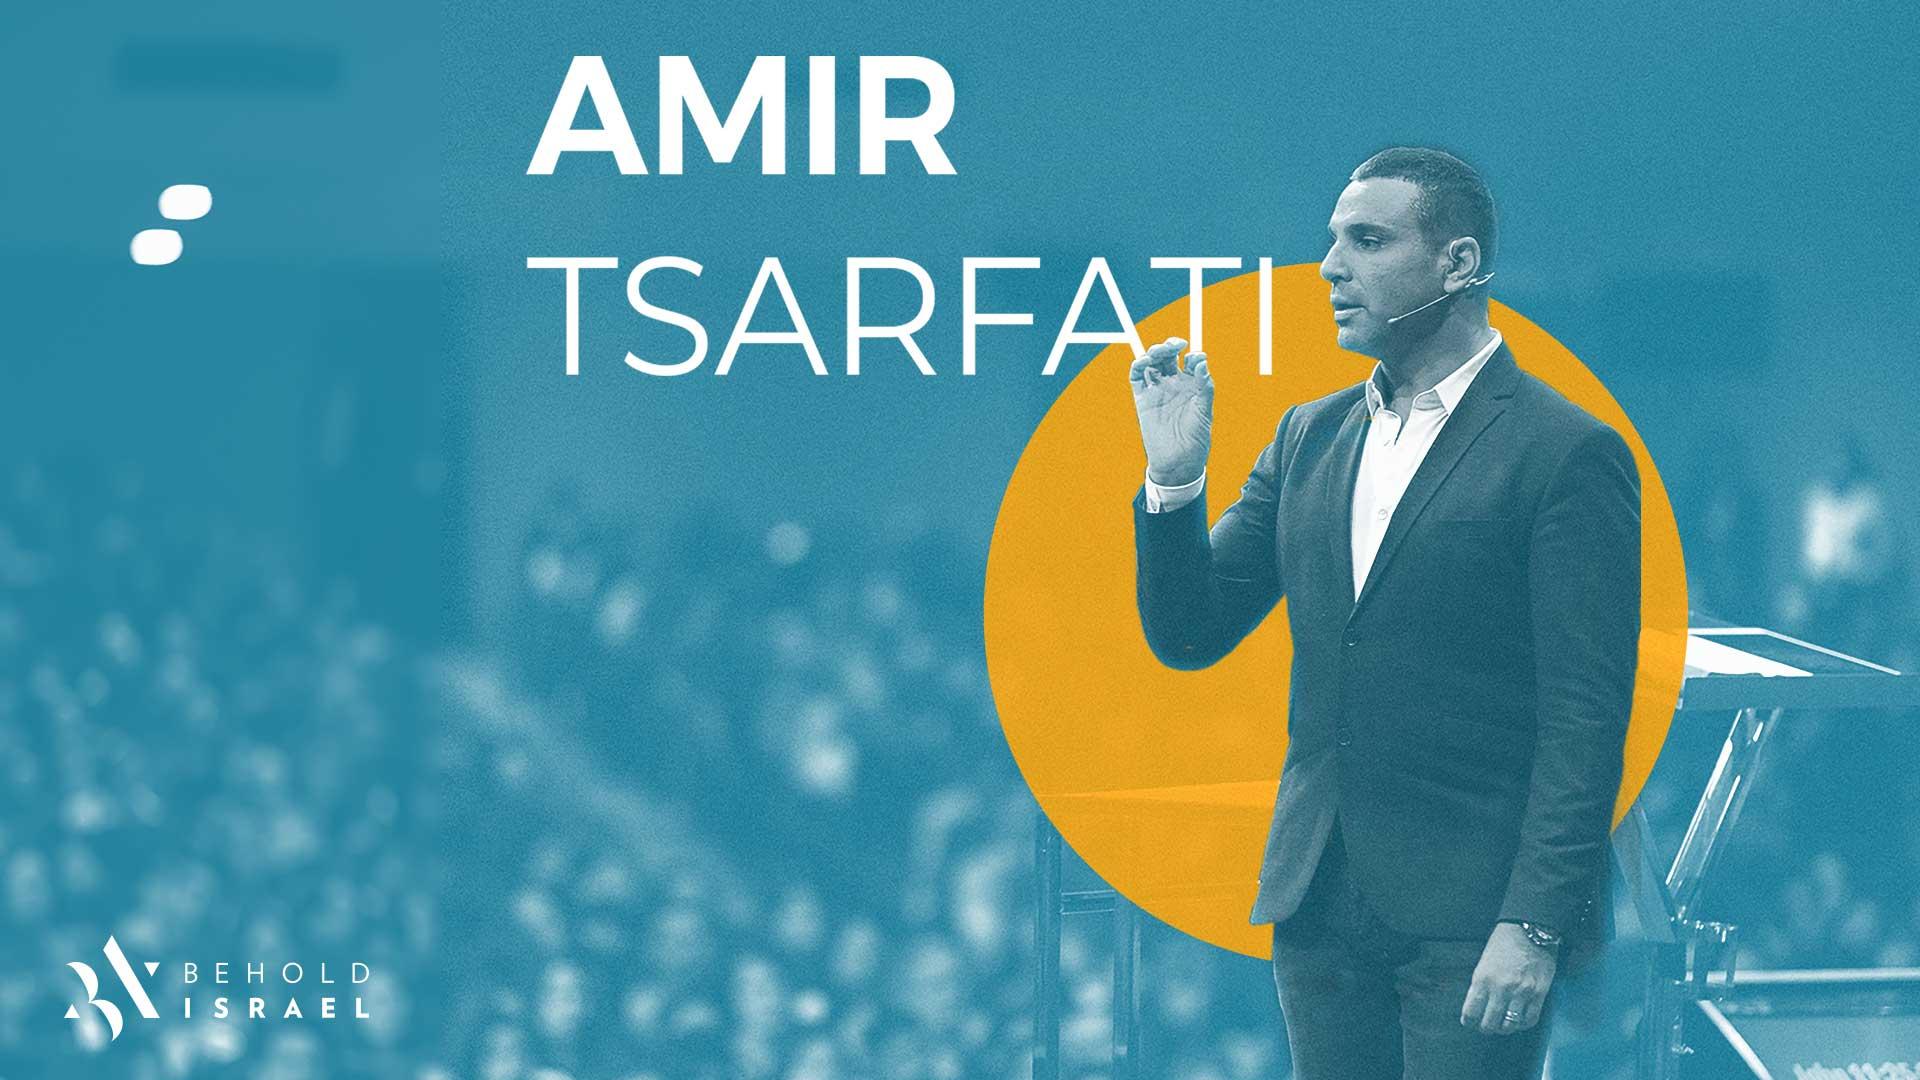 Behold Israel Podcast by Amir Tsarfati